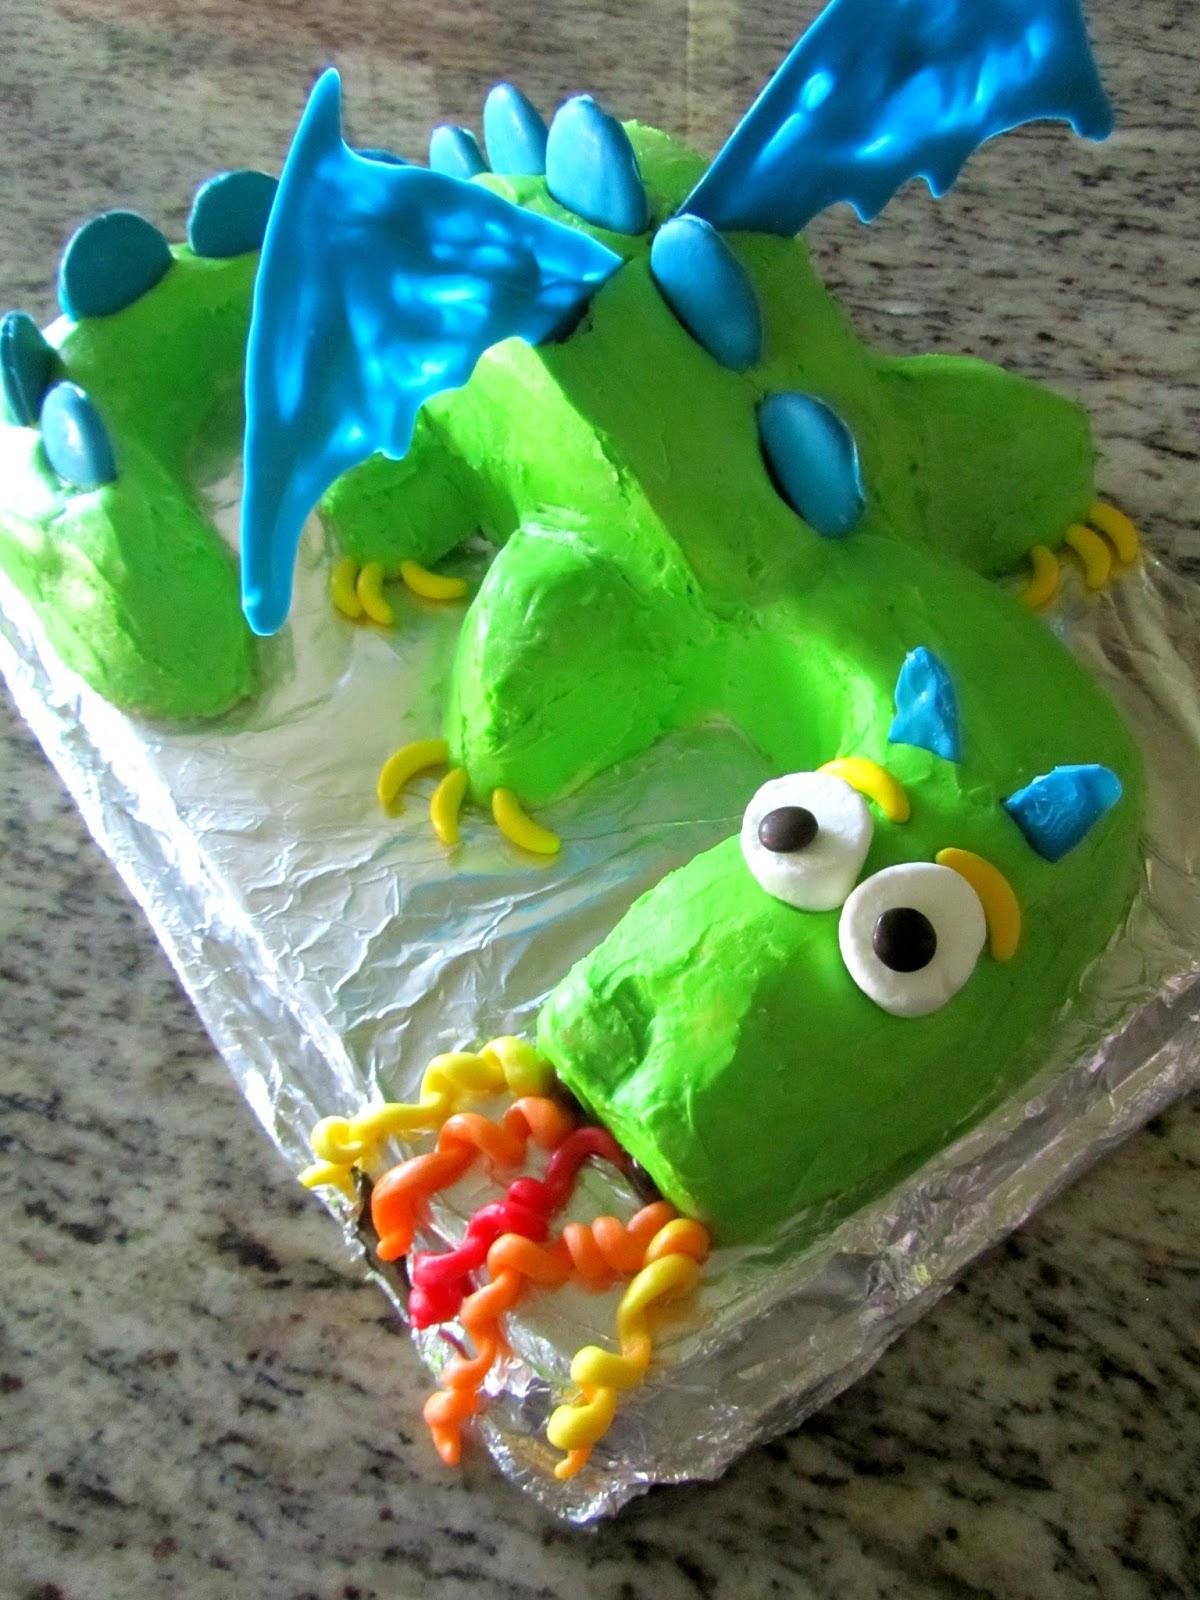 Dragon Birthday Cake | Pinning with Purpose